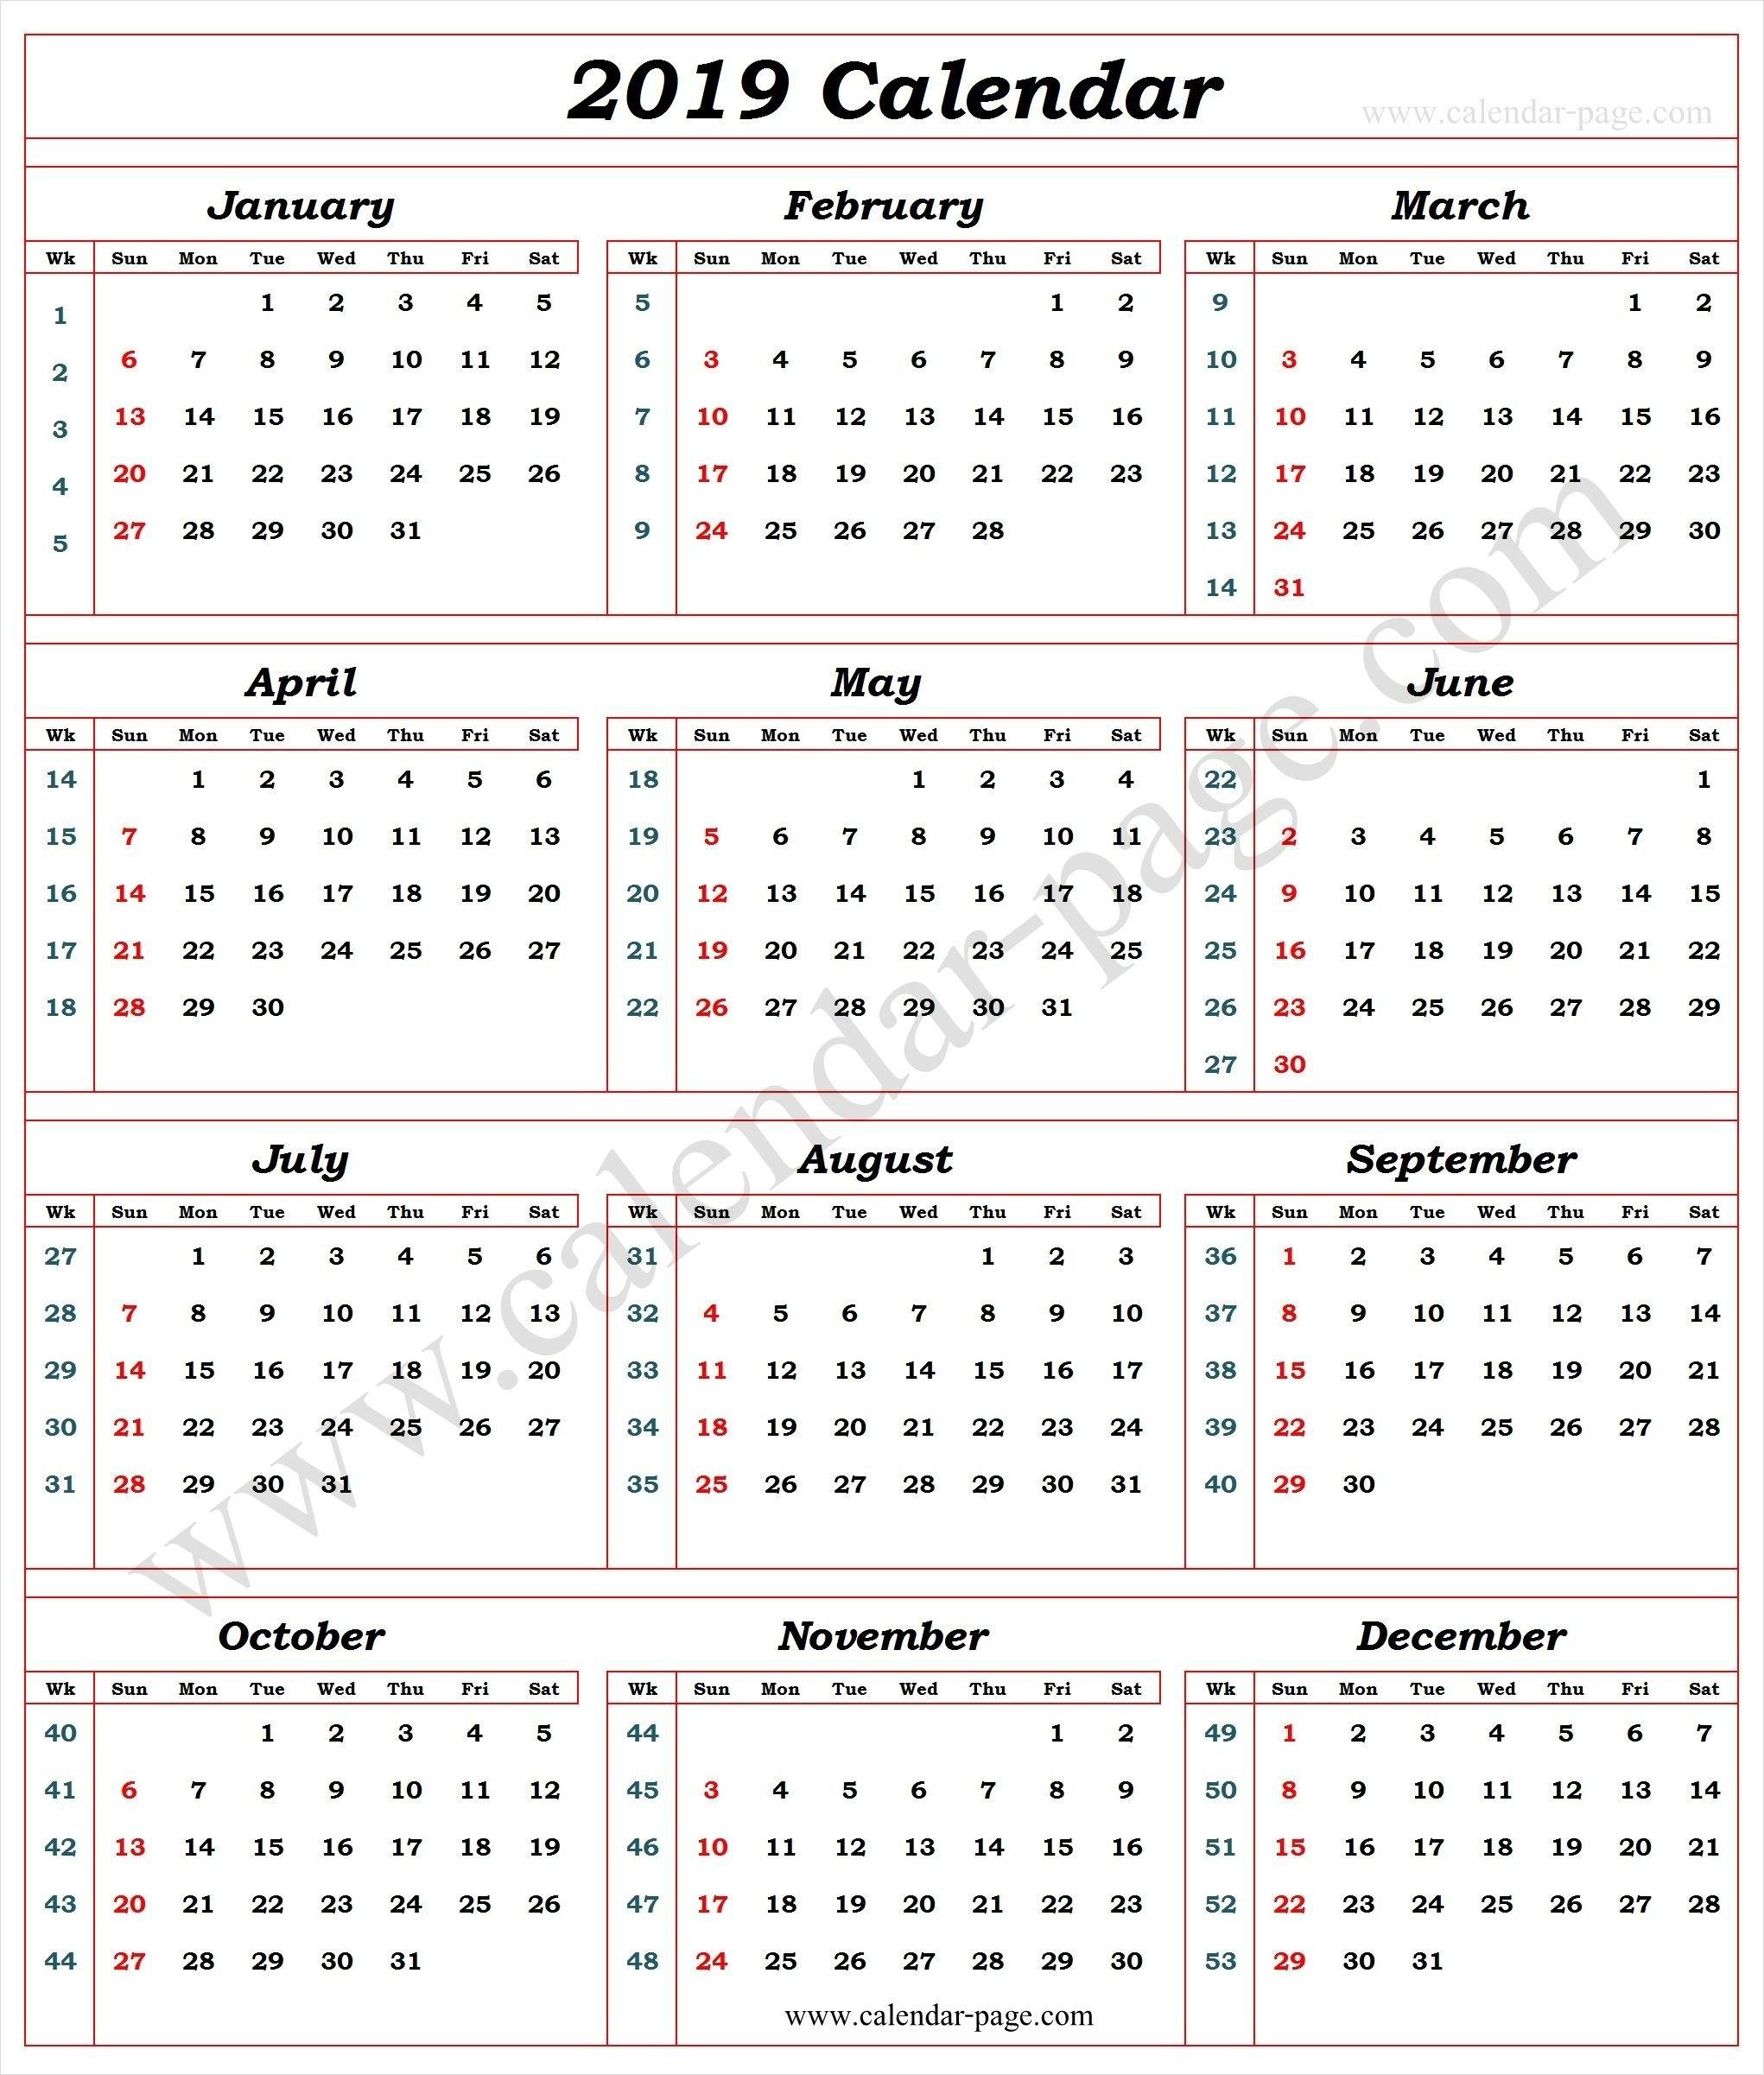 Calendar 2019 With Week Numbers | 2019 Calendar Template | Pinterest Calendar Week 16 2019